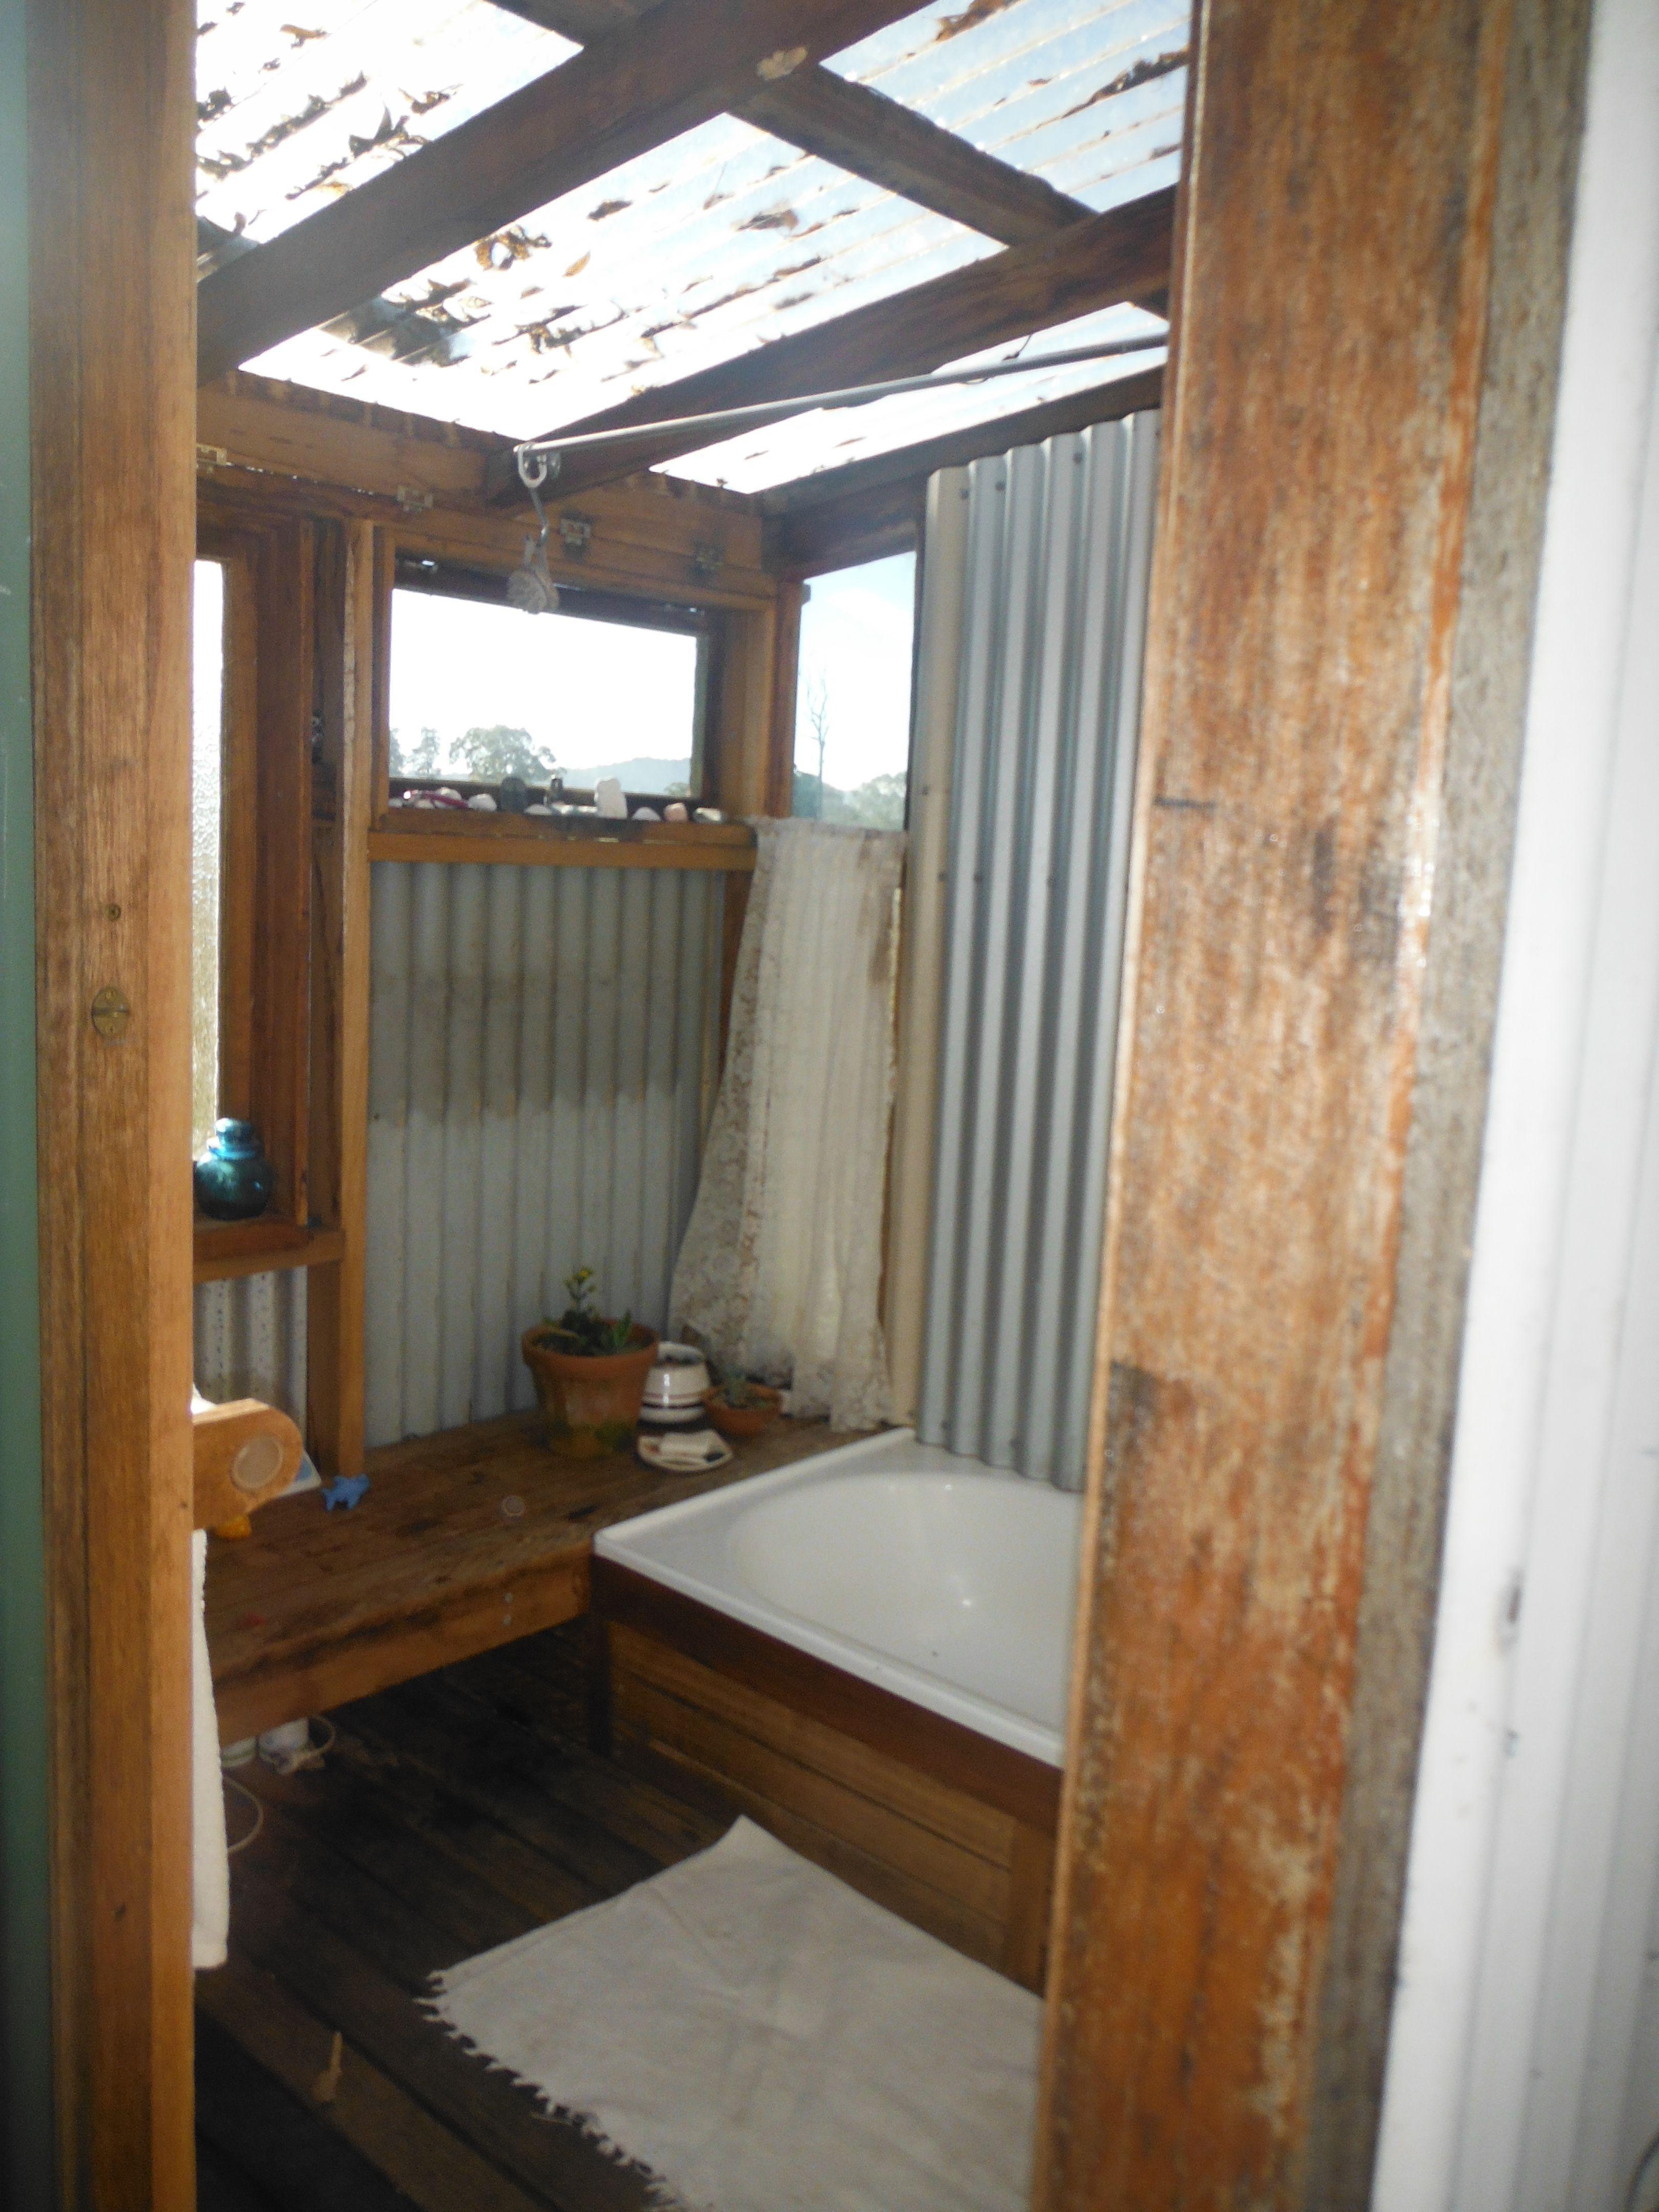 Outside Bathroom Timber Decking Suntuf Roof Corrugated Iron Rustic Bathrooms Outdoor Bathrooms Rustic Bathroom Shelves